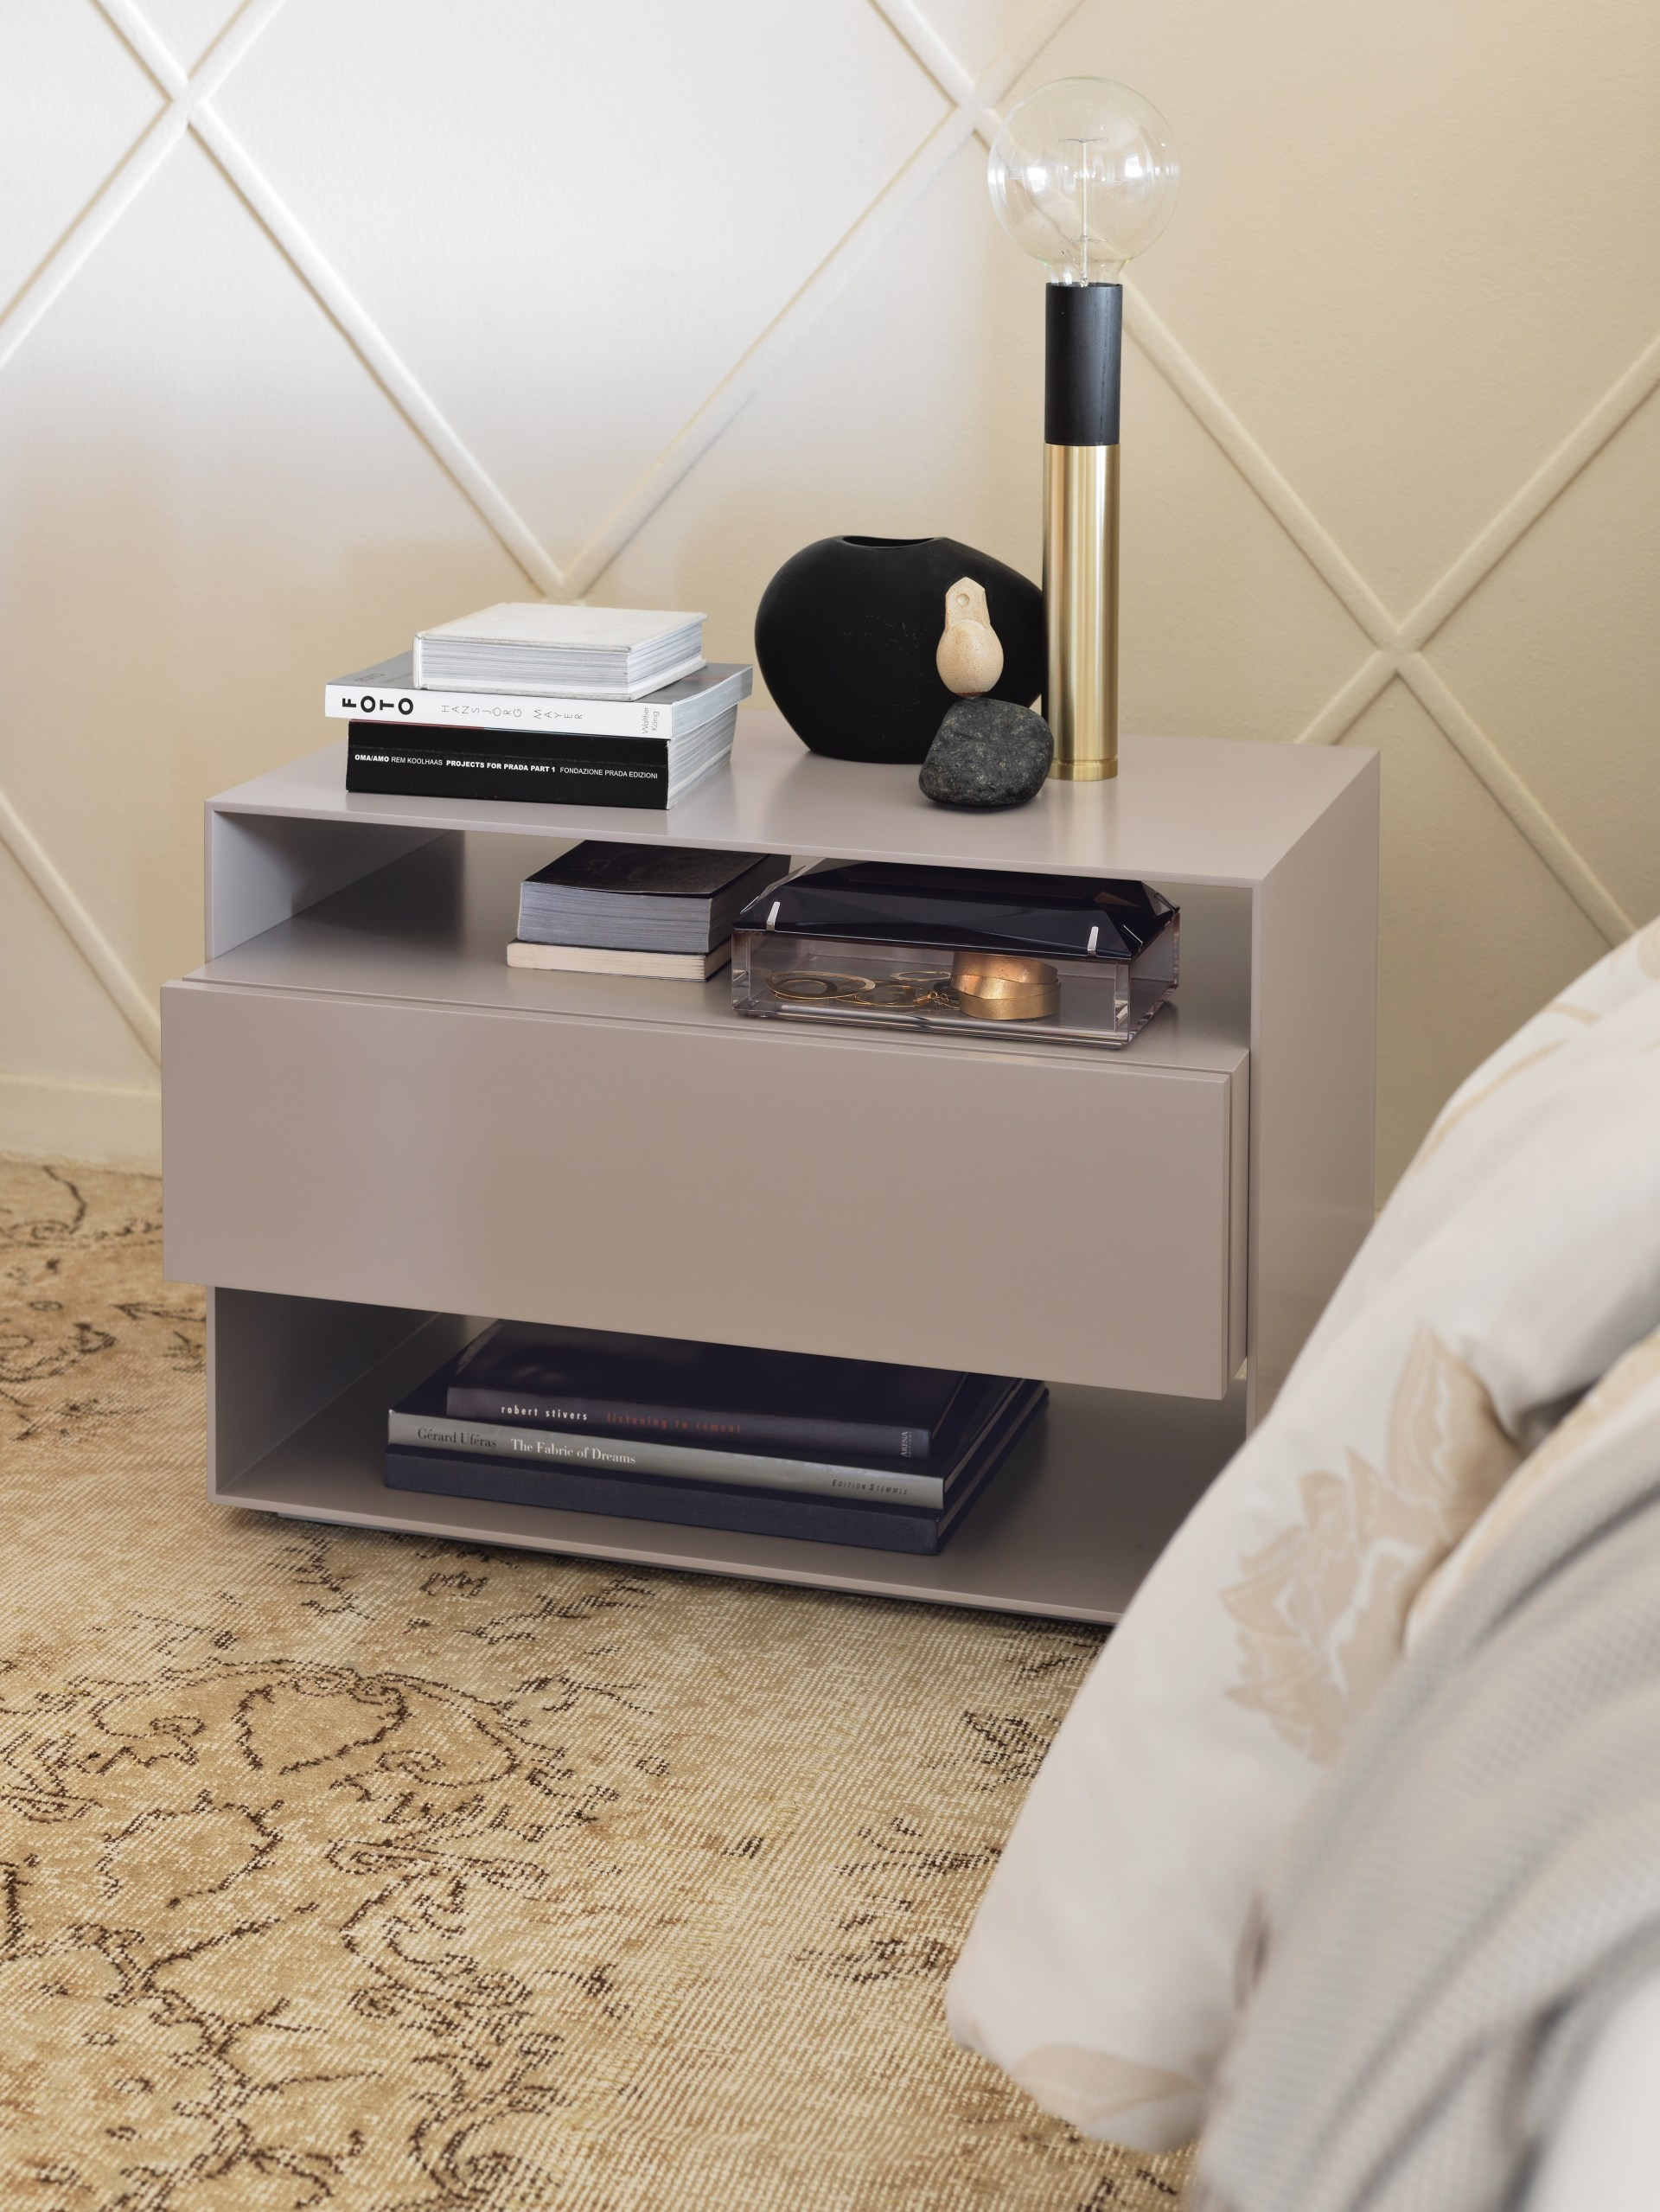 SANYA Bedside Table By Flou Design Carlo Colombo